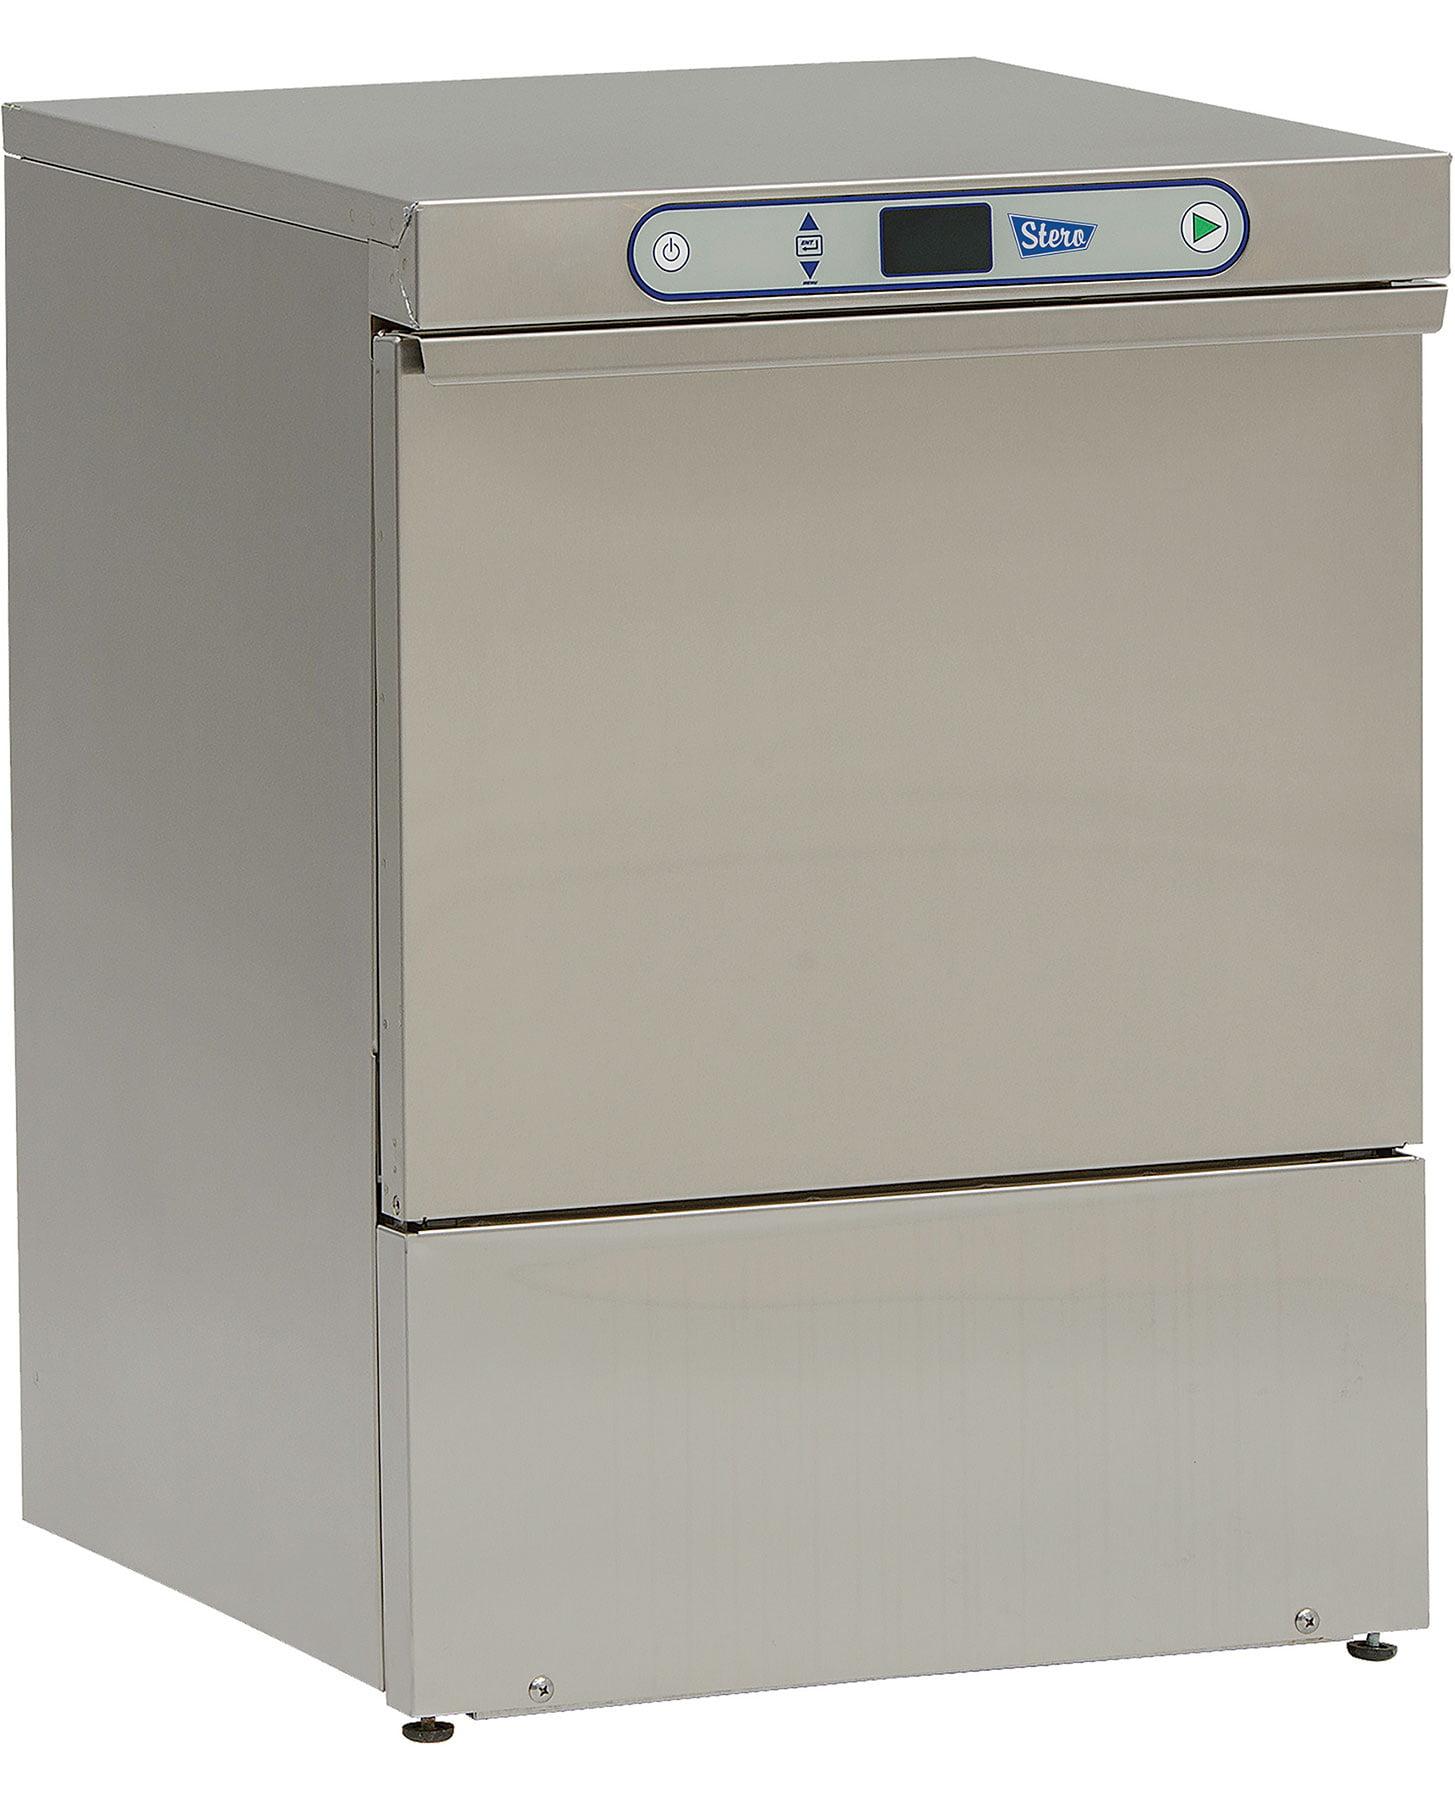 Stero-suh-dishwasher